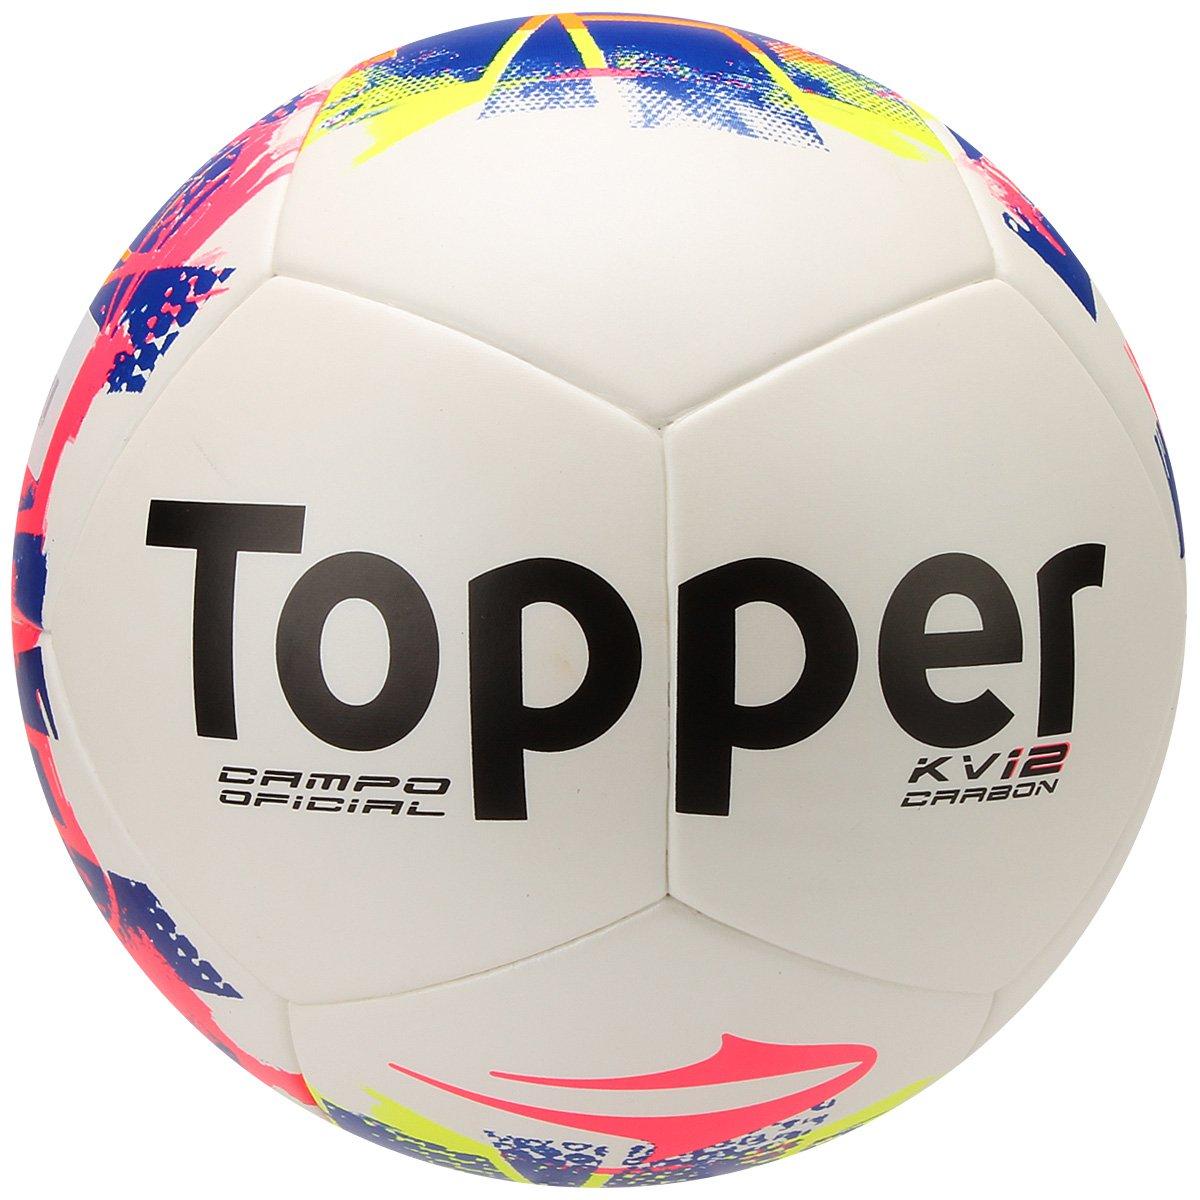 Bola Futebol Topper KV Carbon League 2015 Campo - Compre Agora ... e1131db92cf67